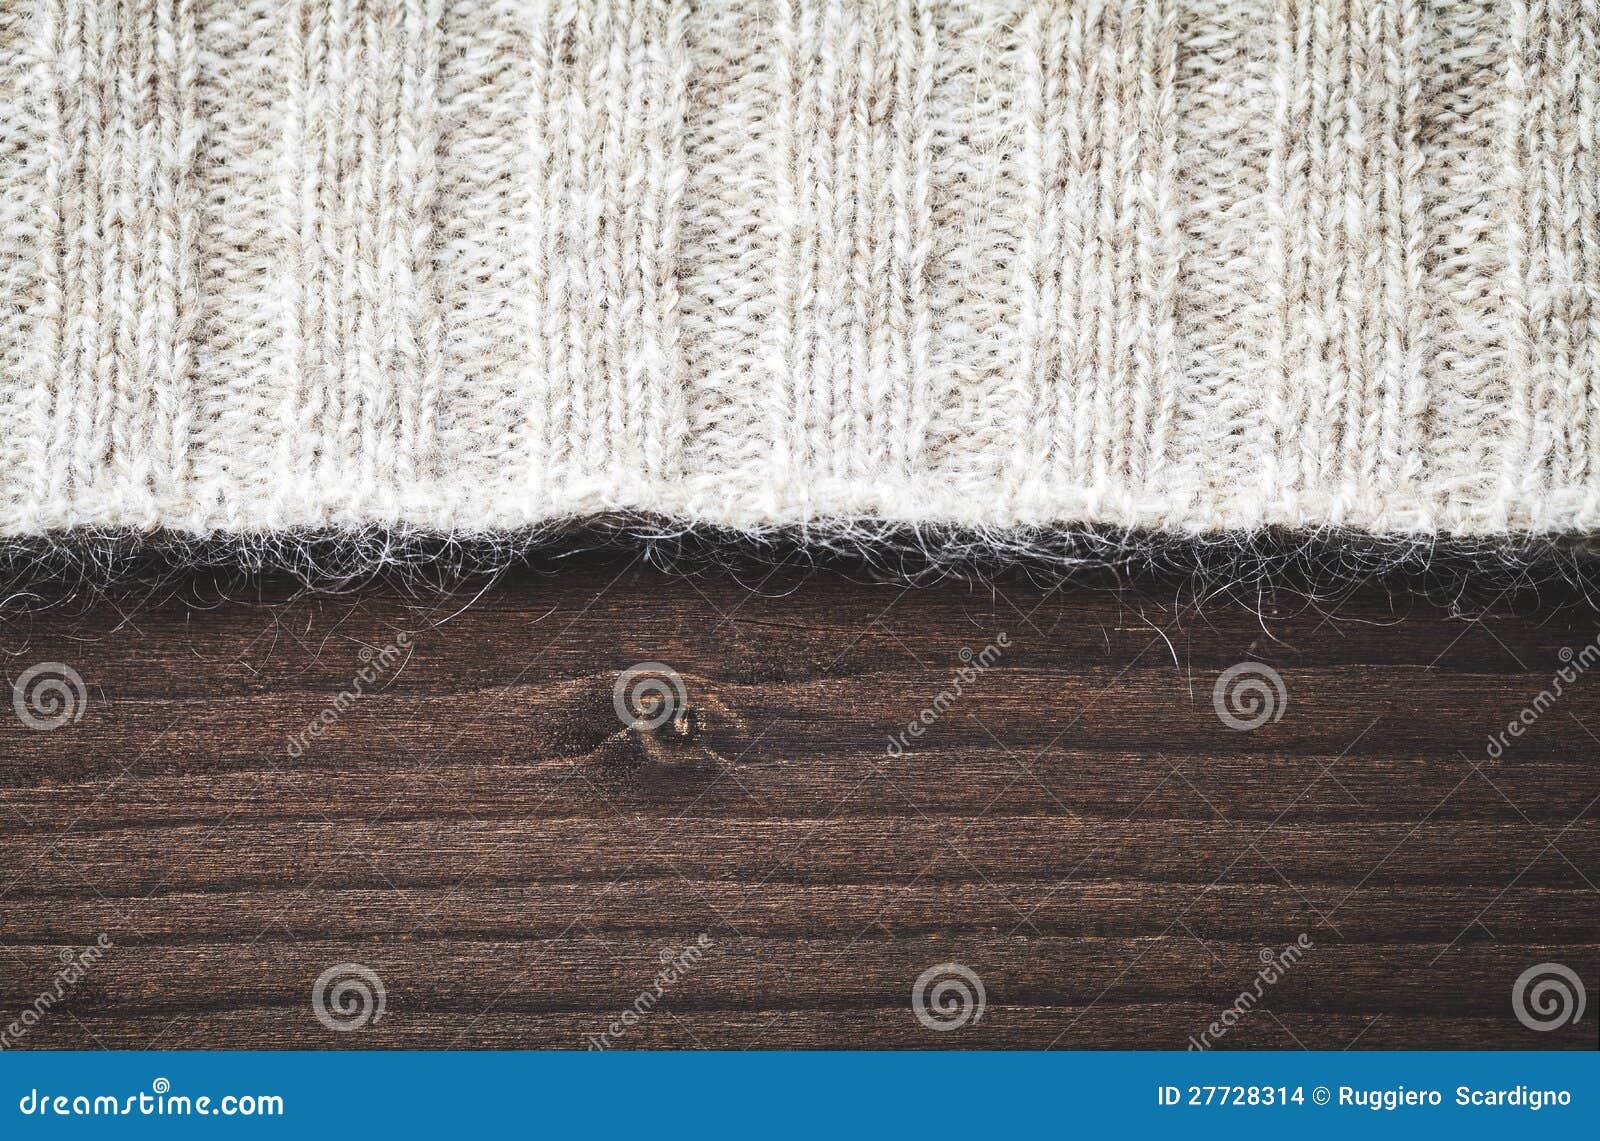 Wollestrickjacke auf Holz